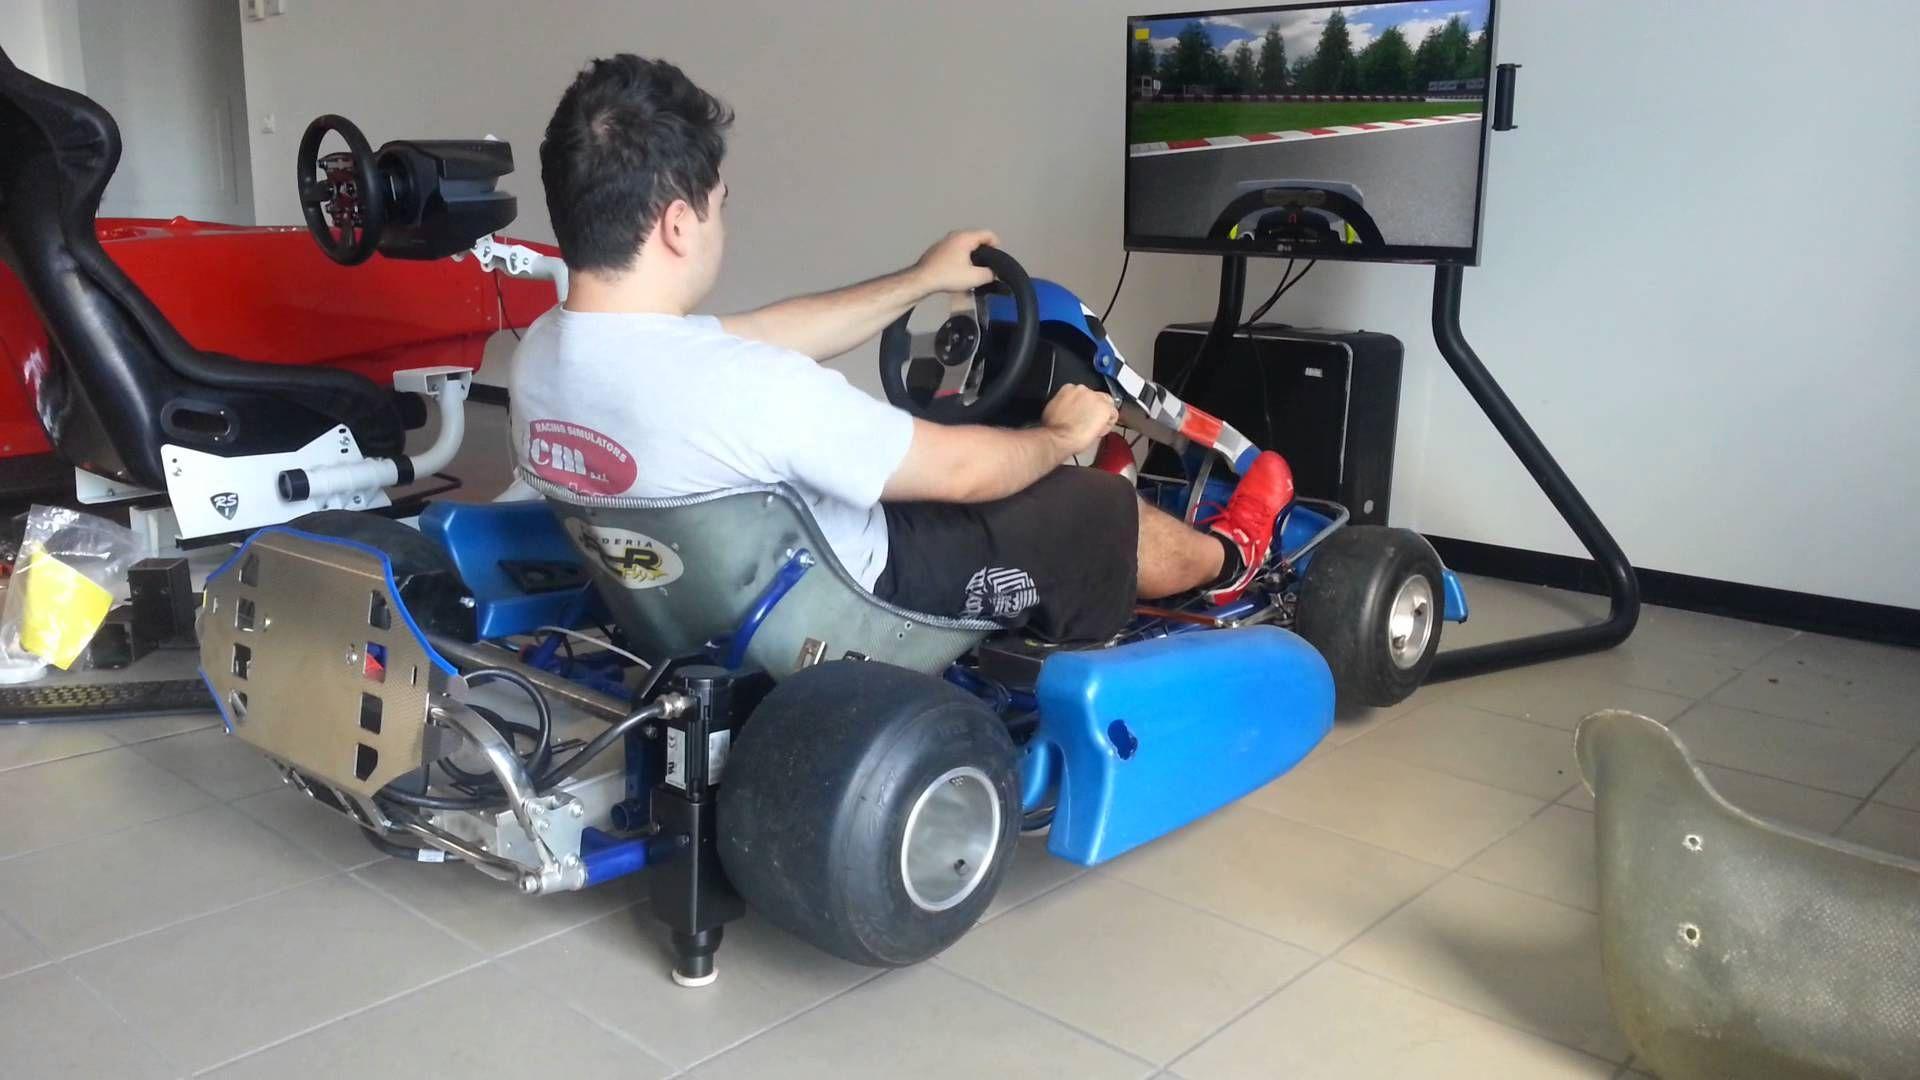 Cool kart racing simulator with motion httpwww